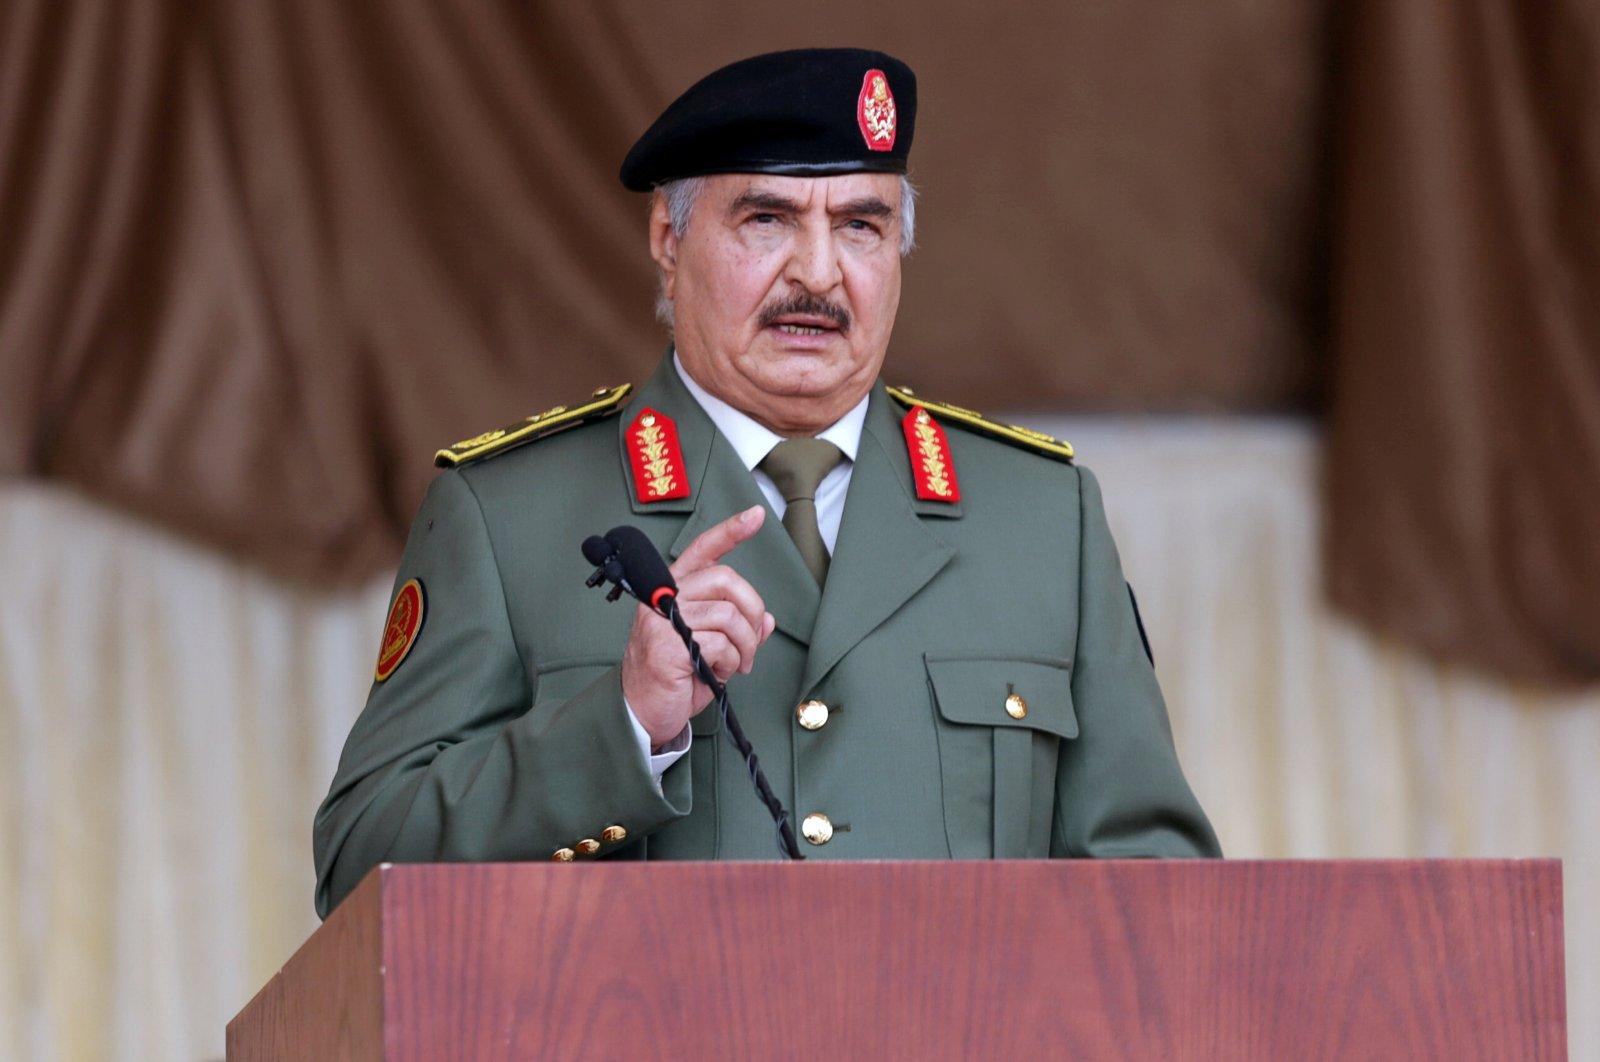 Putschist Gen. Khalifa Haftar gestures as he speaks during Independence Day celebrations in Benghazi, Libya Dec.24, 2020. (Reuters File Photo)